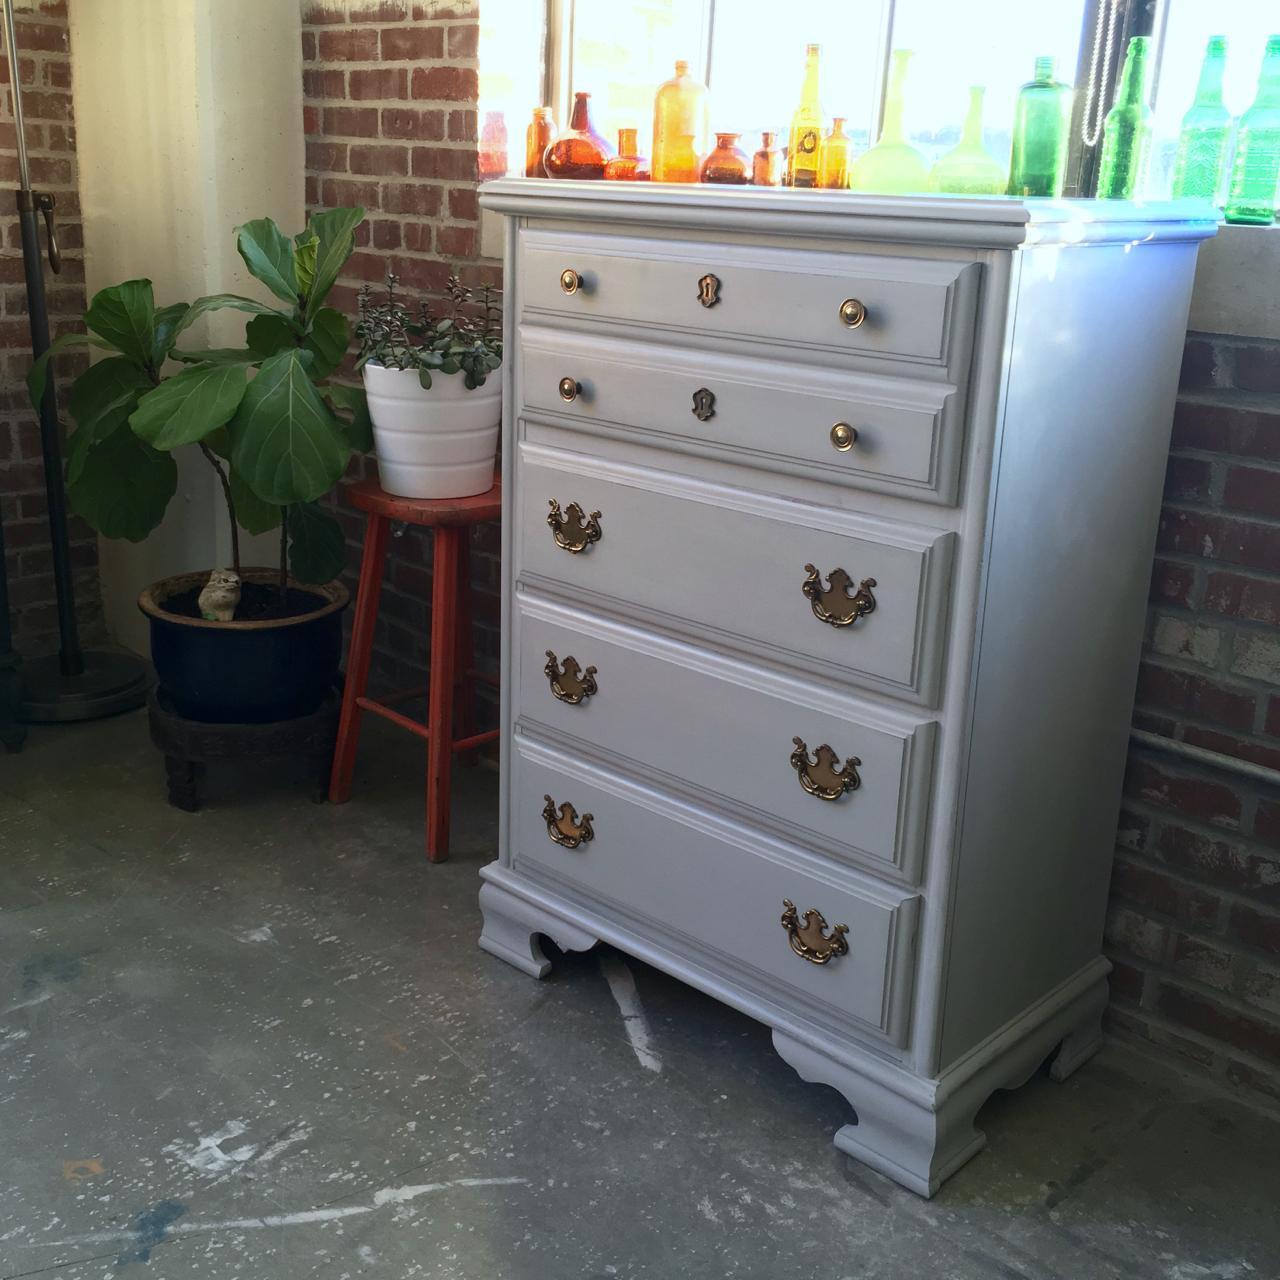 jo-torrijos-a-simpler-design-atlanta-painted-furniture-light-gray-dresser-4.jpg